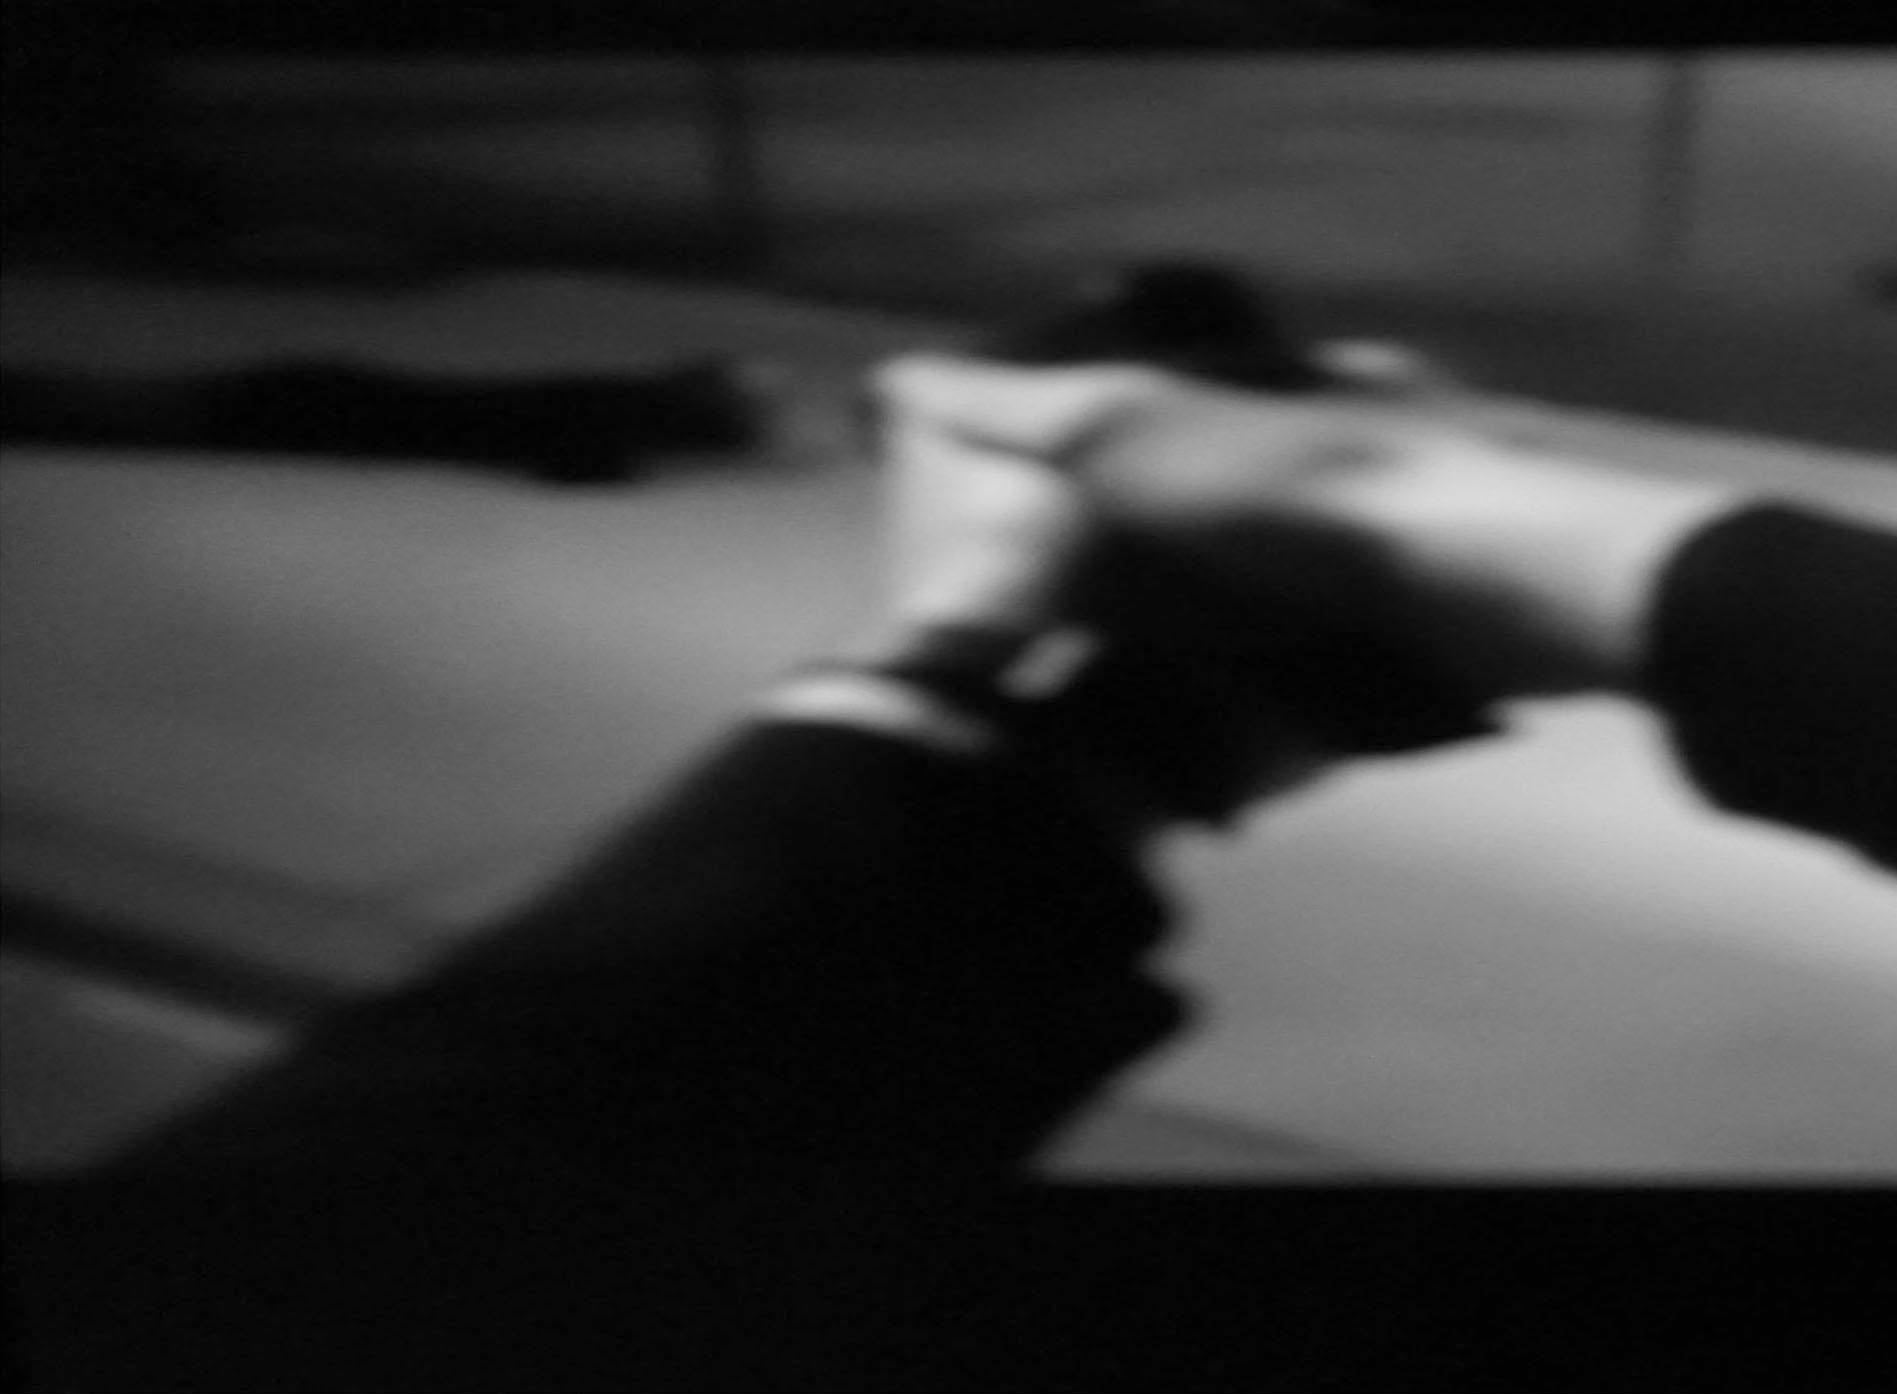 Dennis Reed, #25 Bodycam, 2017